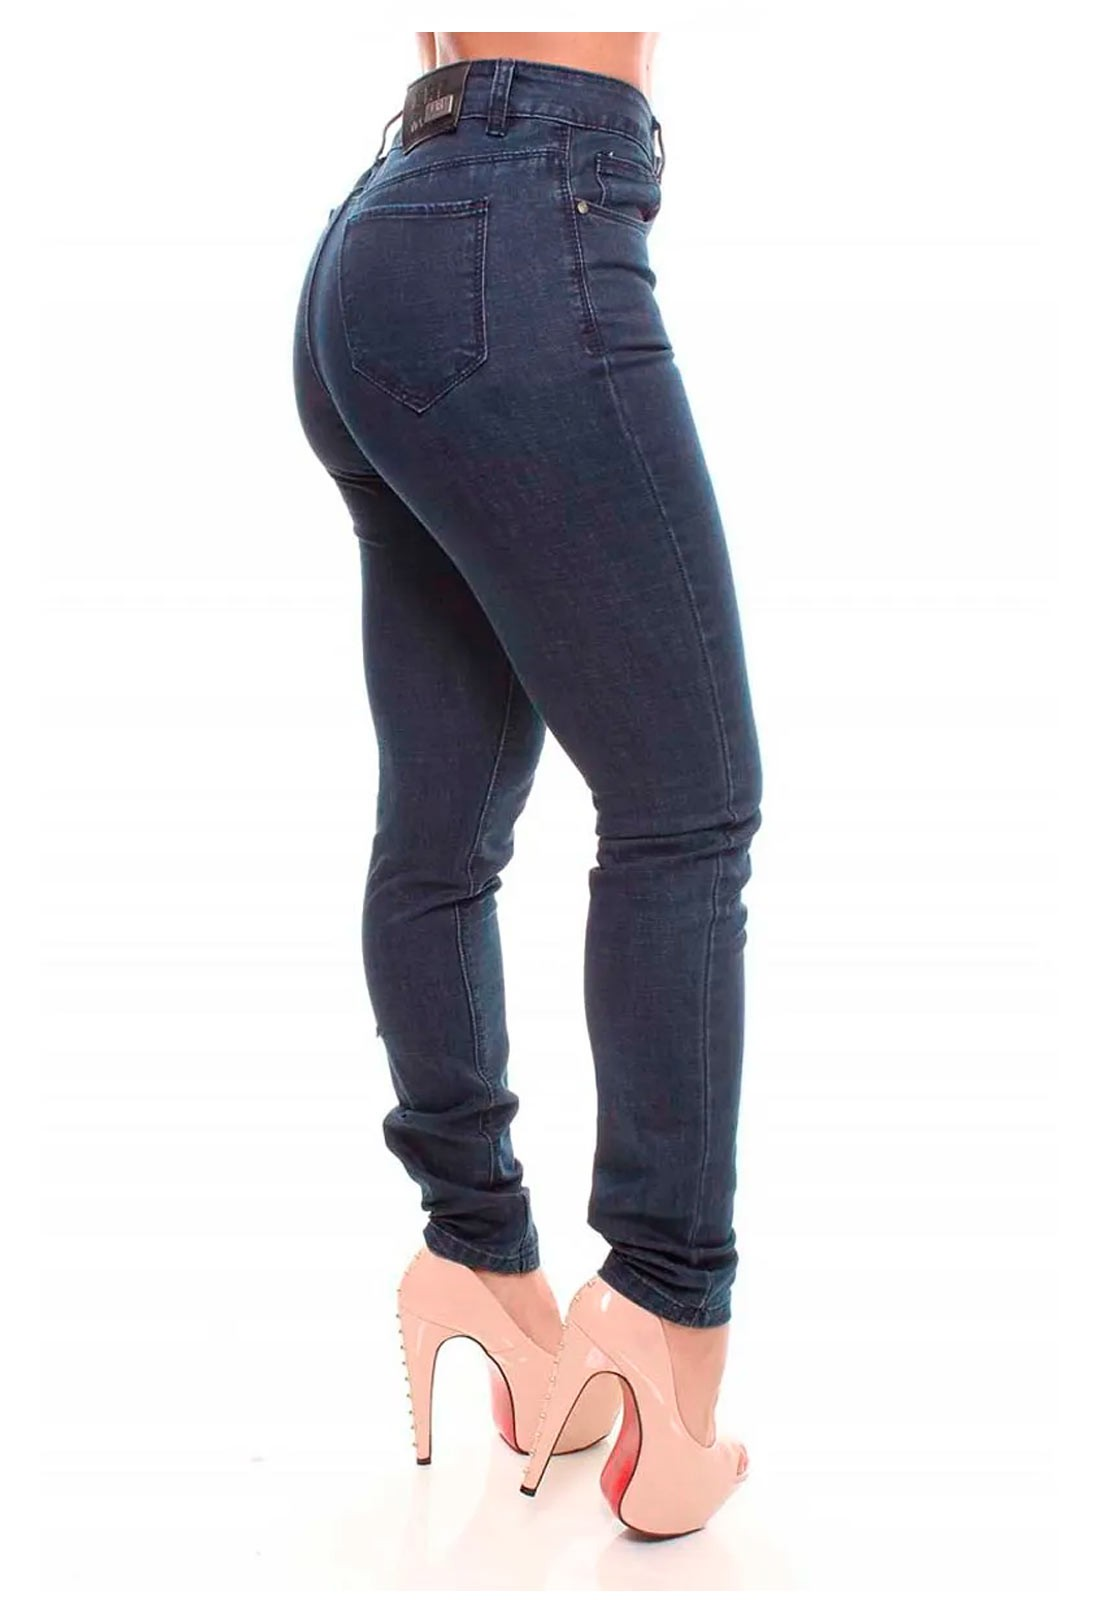 Calça Jeans Feminina Skinny Crocker - 46307  - CROCKER JEANS